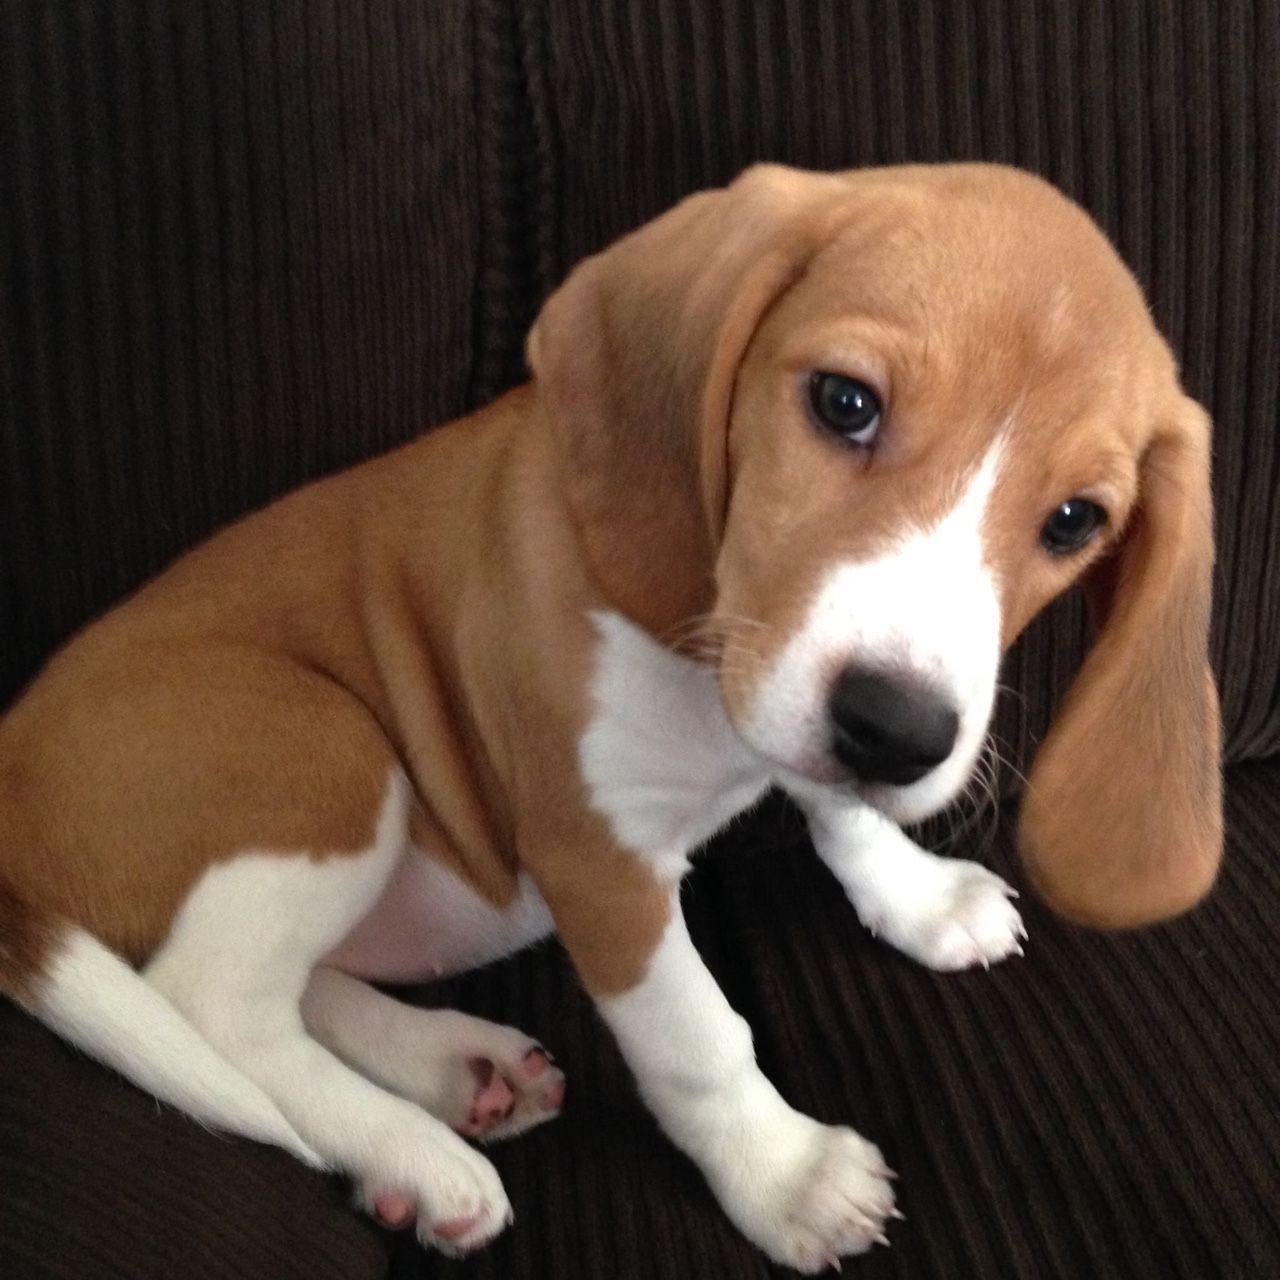 Beagles Are Awesome Compilation Beagle Puppy Beagle Dog White